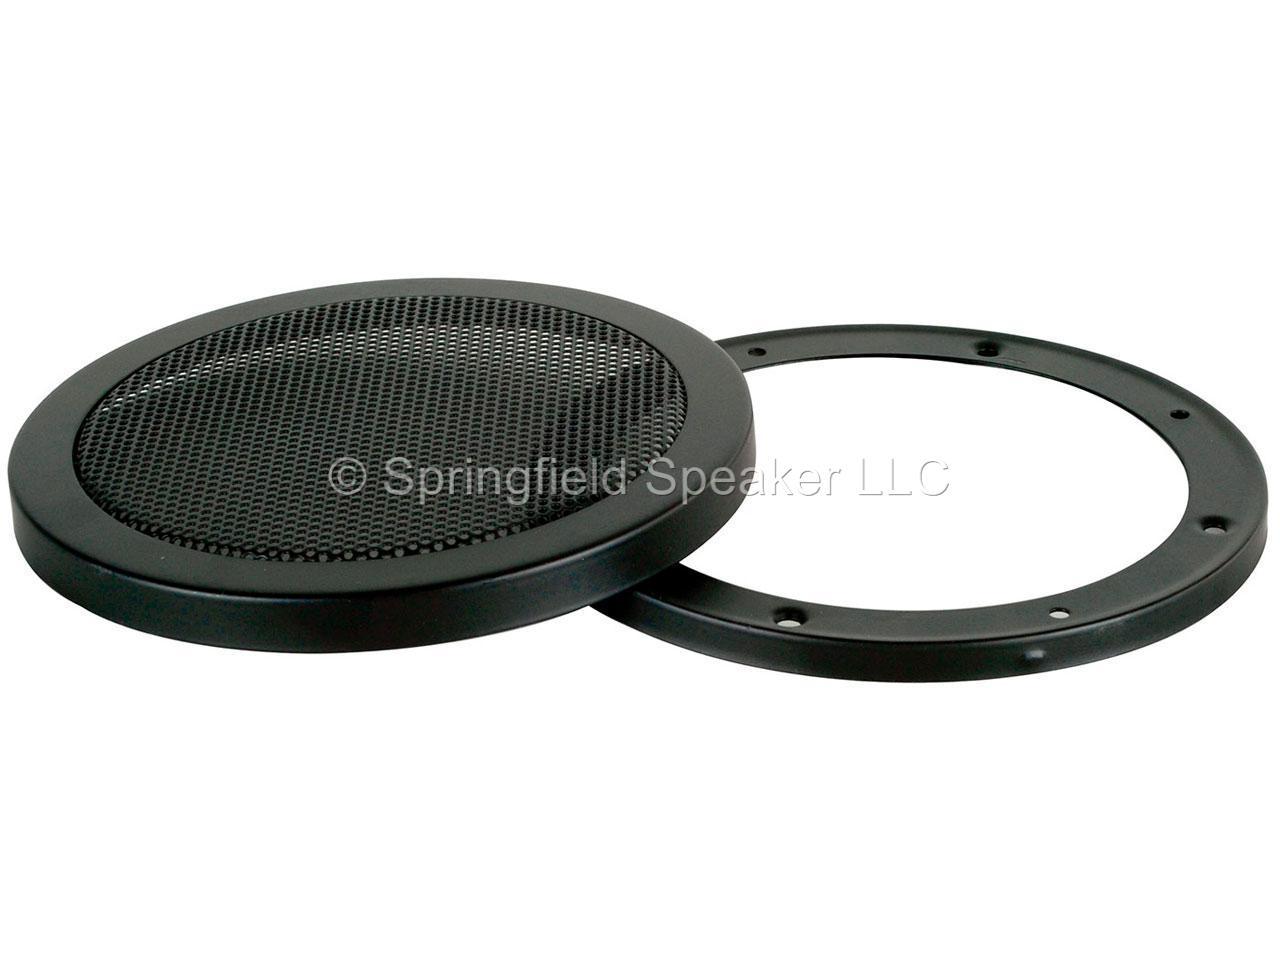 Car speakers covers